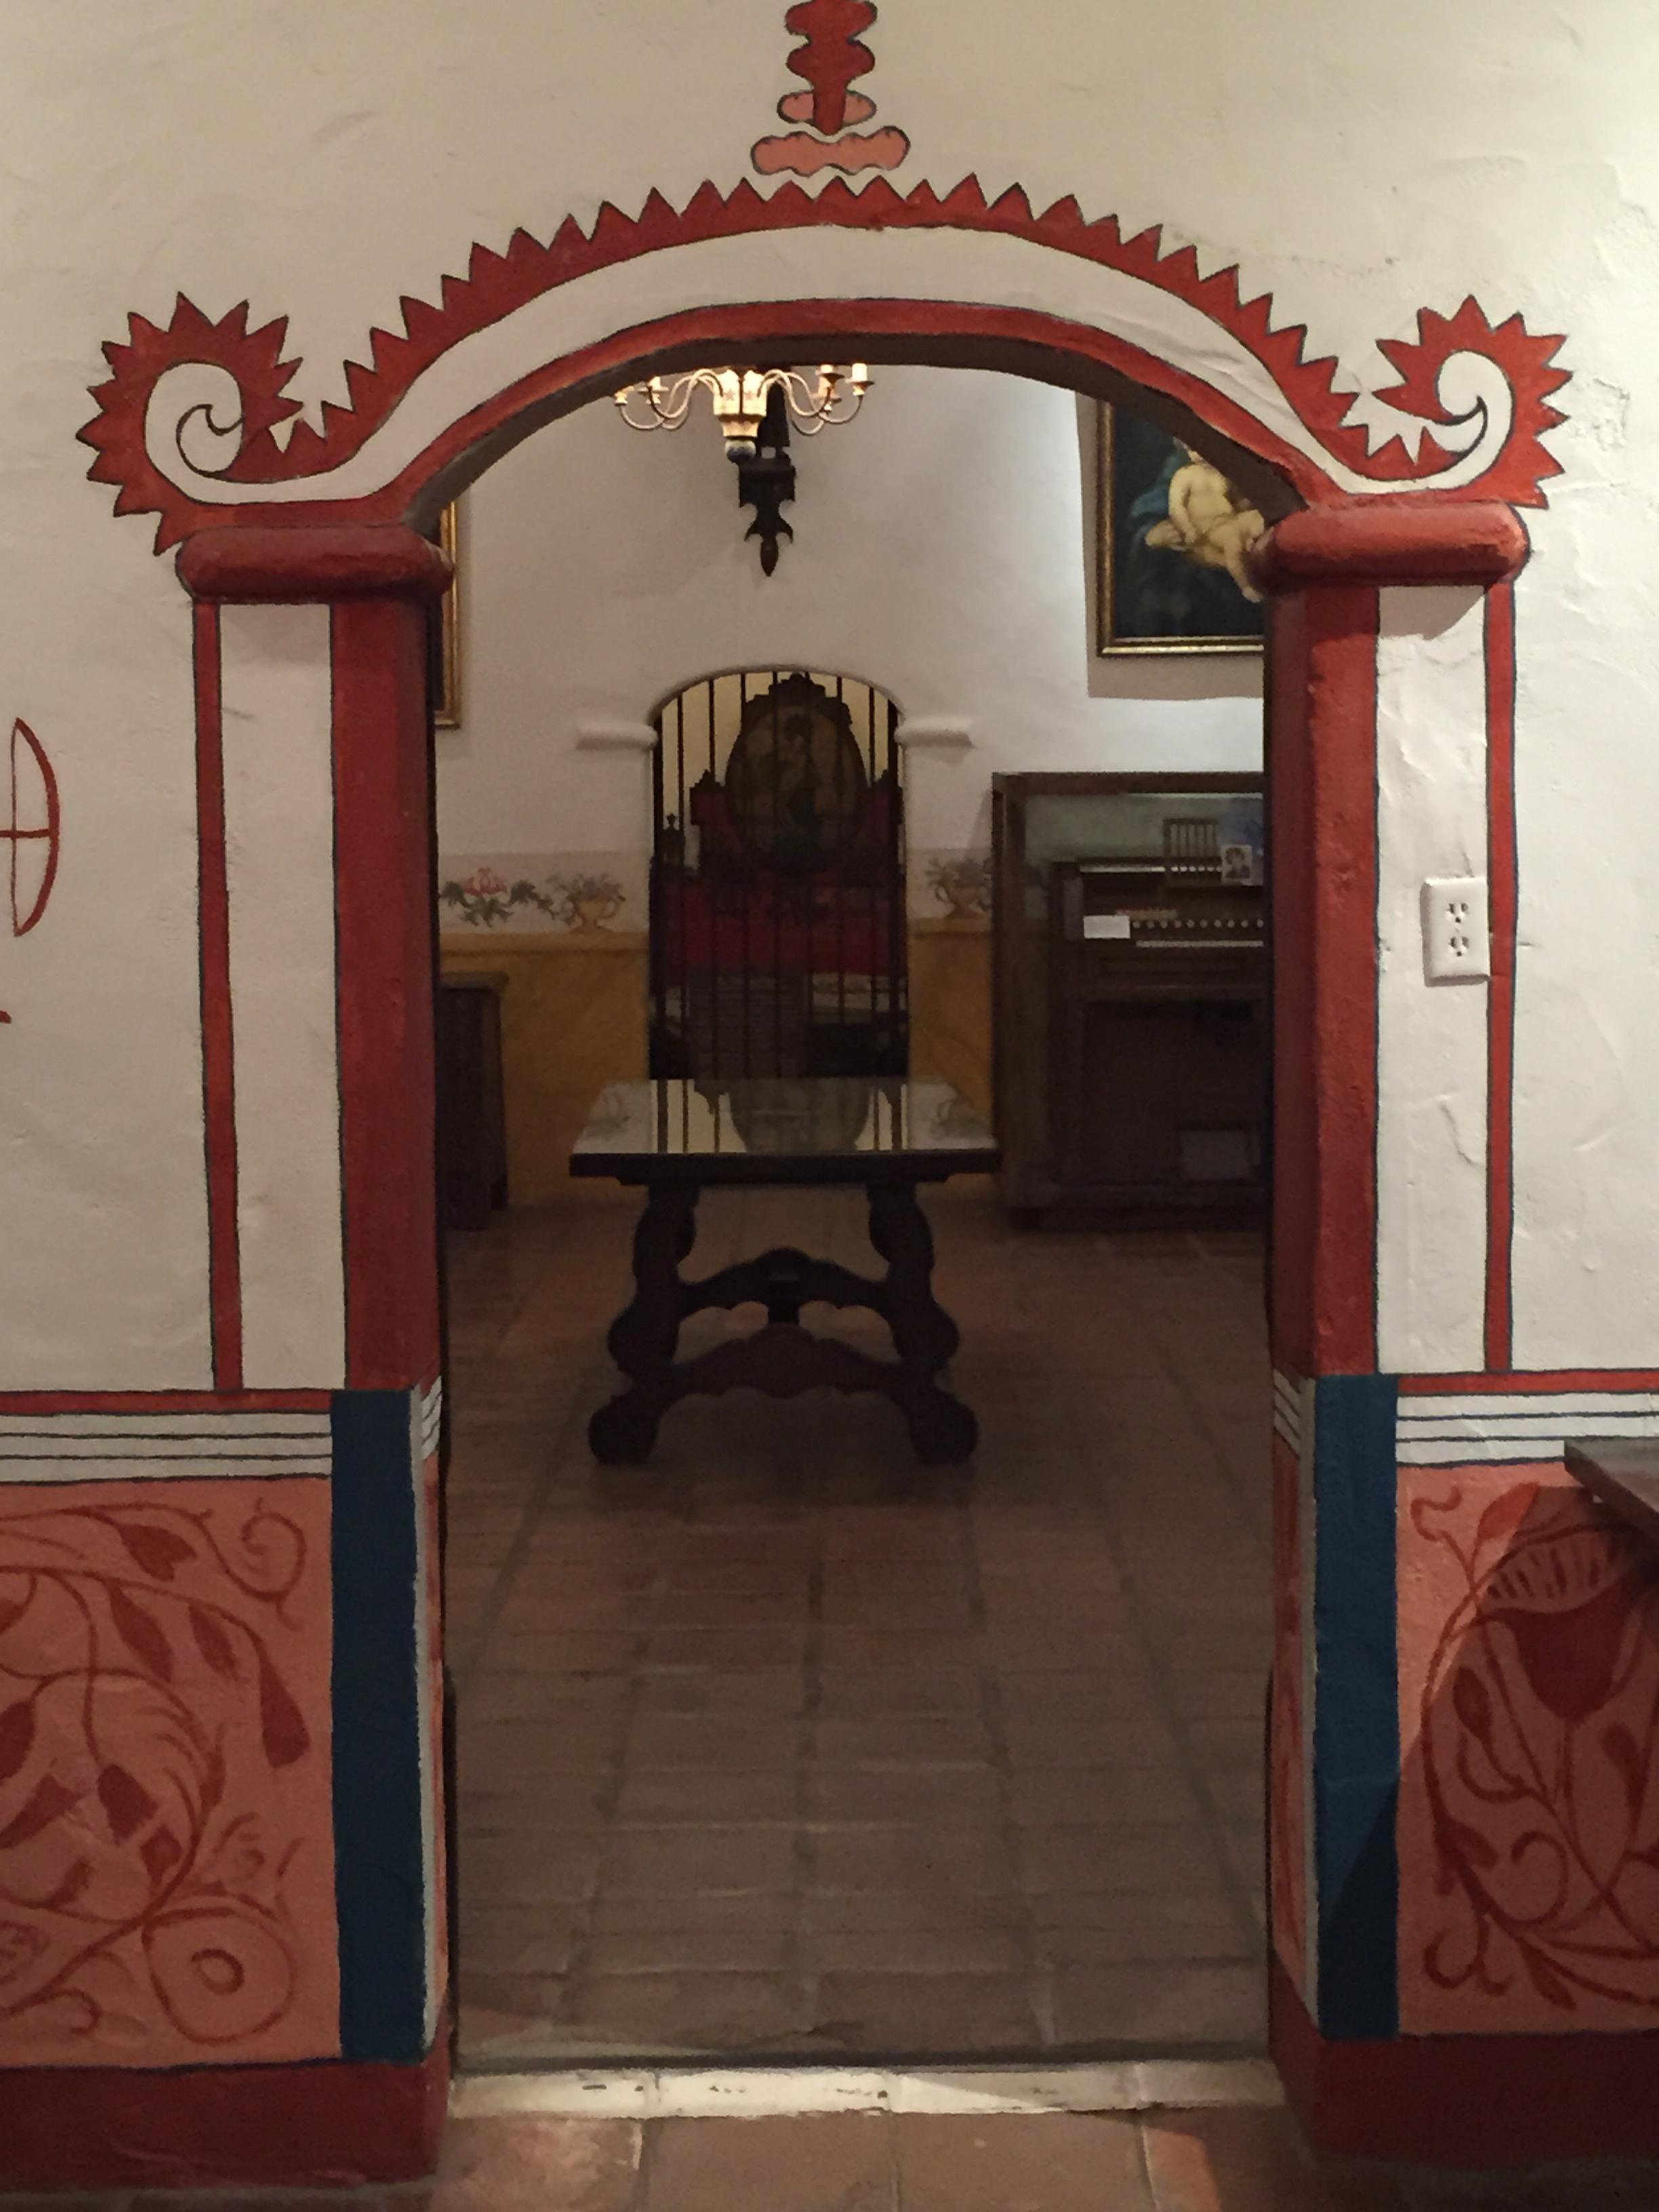 San fernando Mission painted door frame - ventura santa Barbara san Fernando Missions